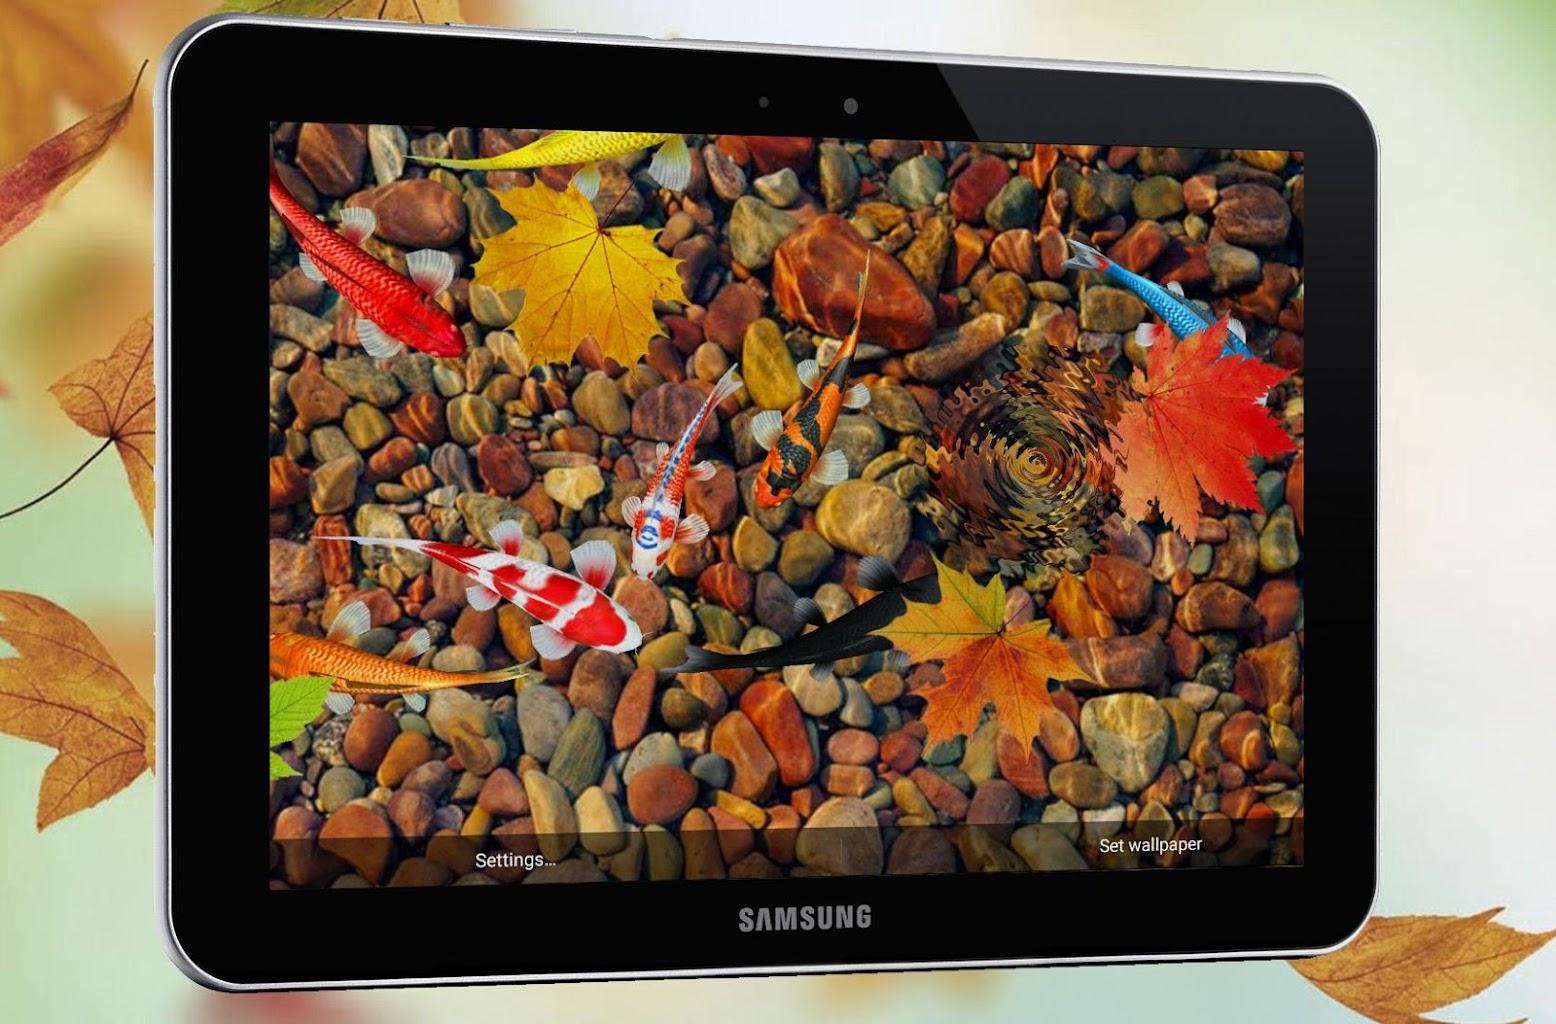 KOI Lucky Fish Live Wallpaper 1.0 Apk Download - sonisoft ...